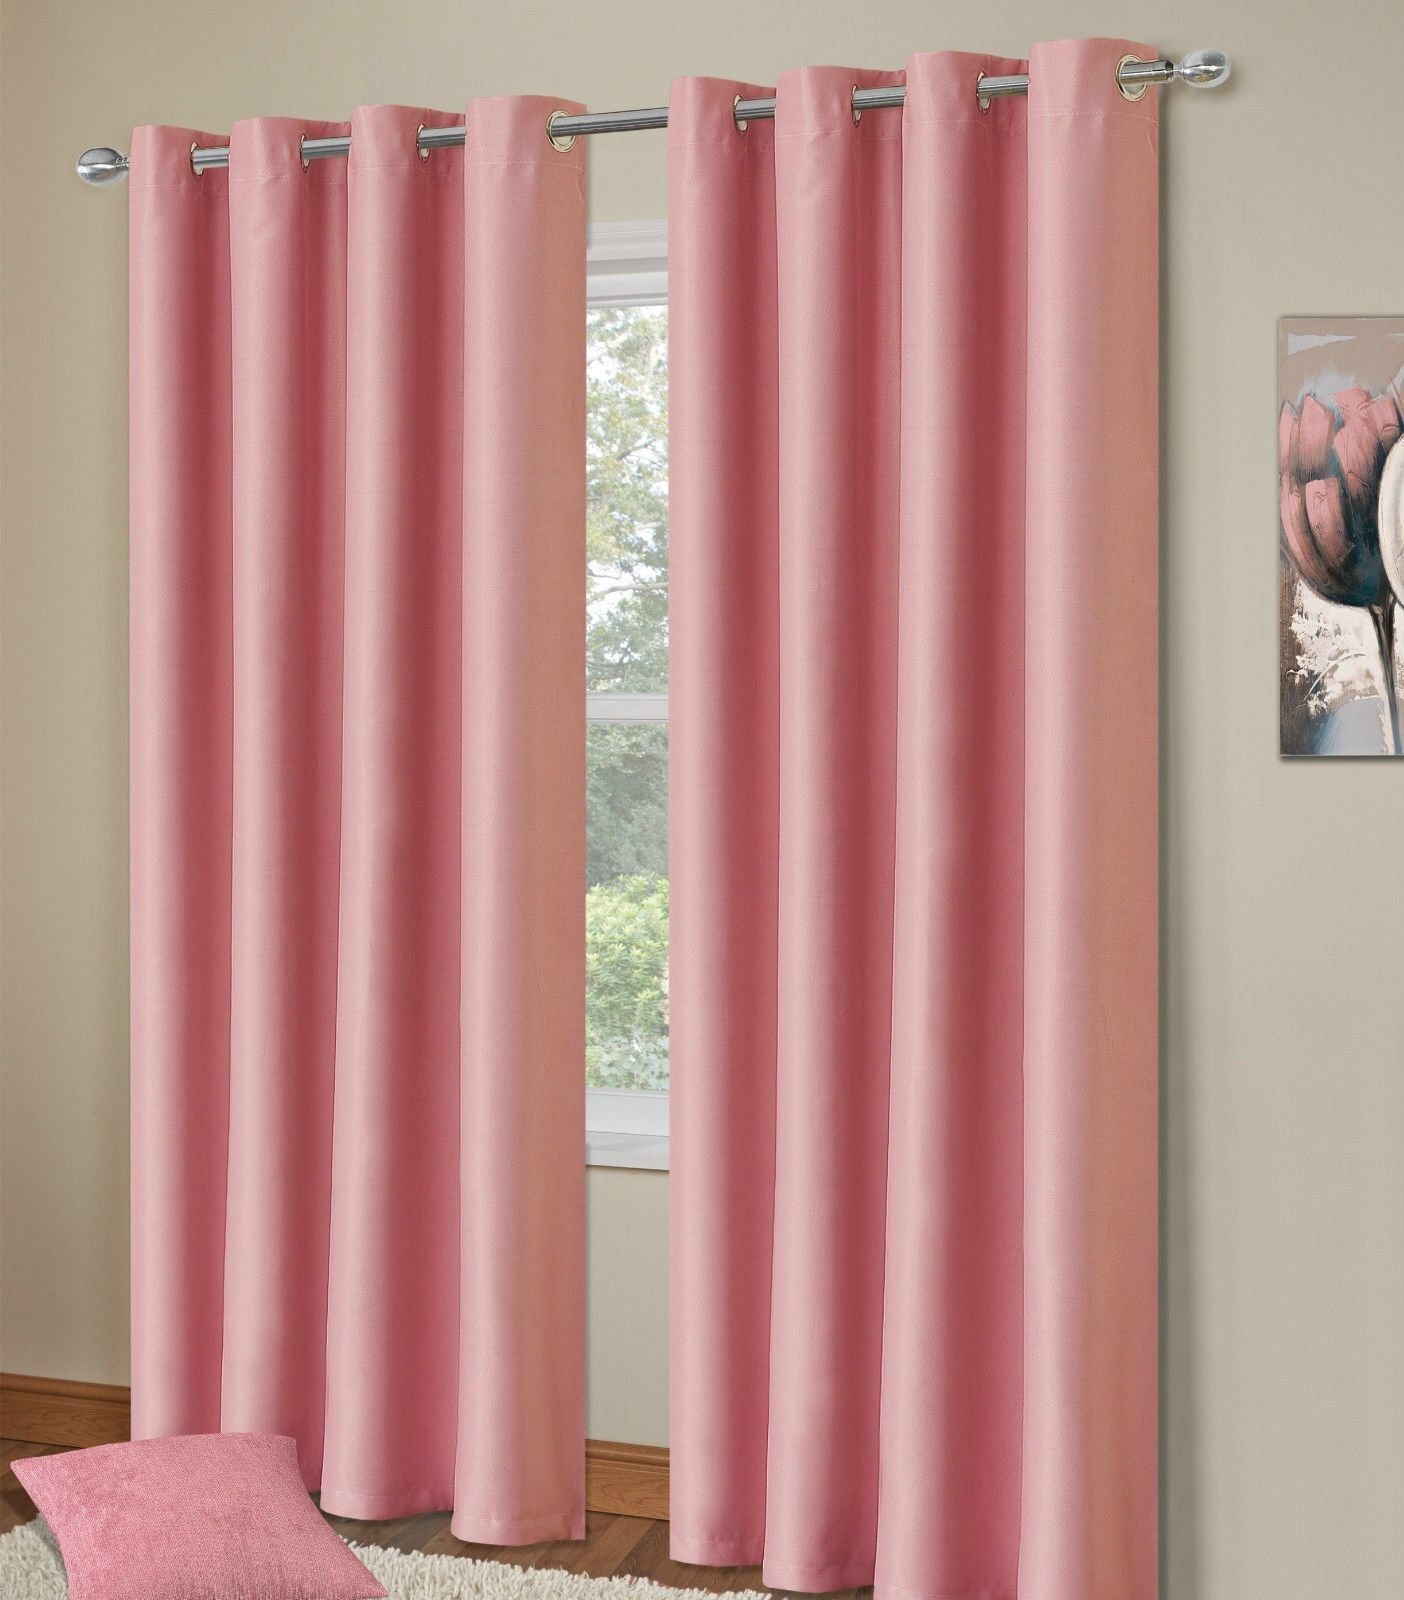 plain-baby-pink-colour-thermal-blackout-bedroom-livingroom